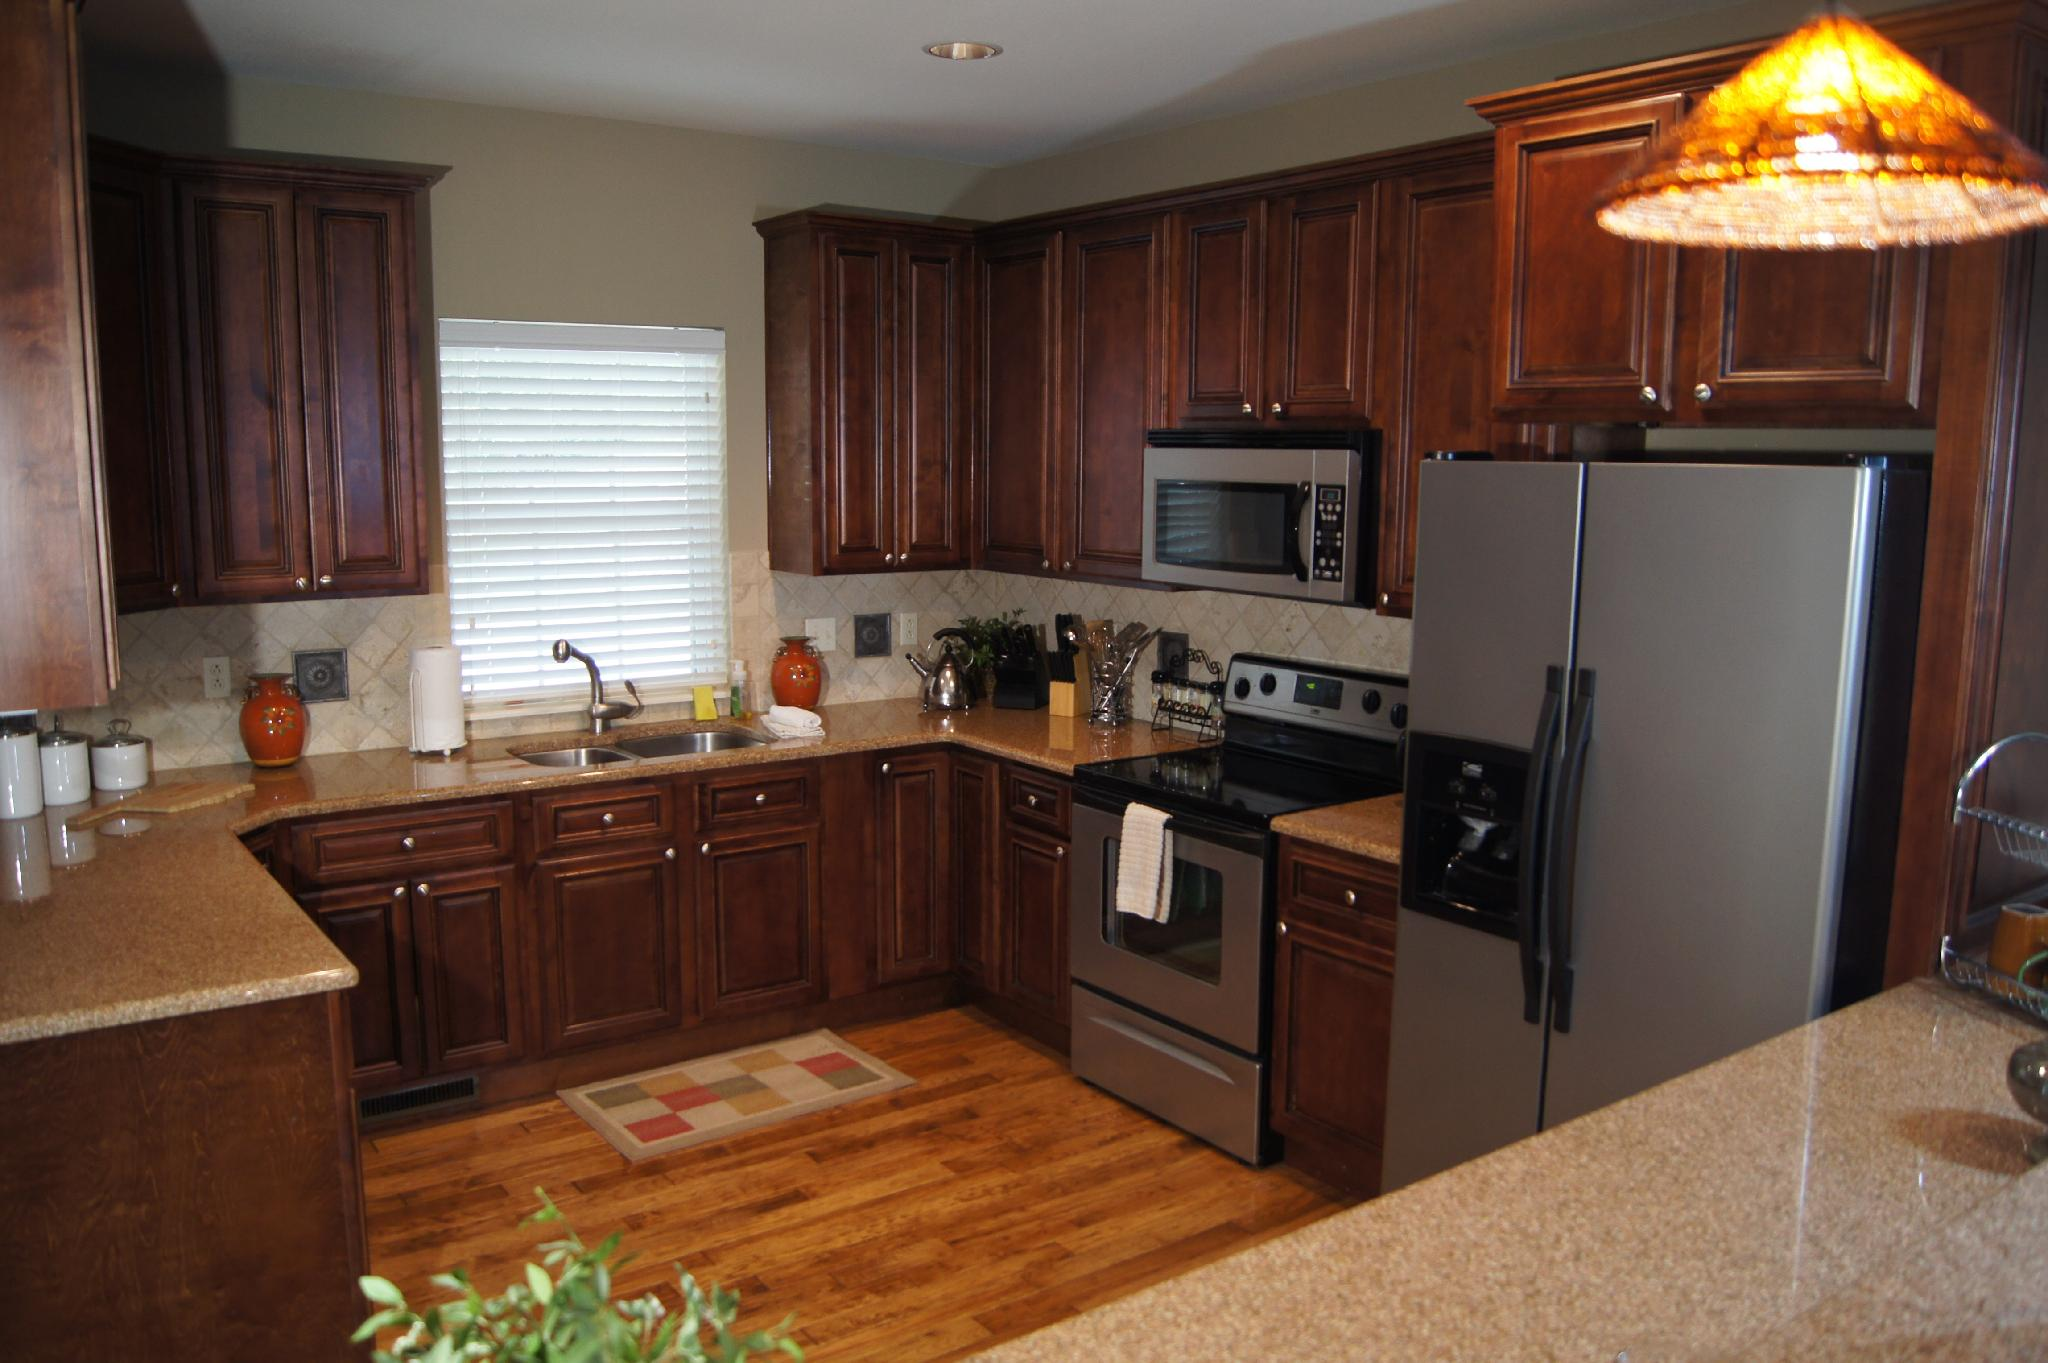 Large, Walk in,  2600 sq ft Private Villa. Huge Deck, 5 TV's , WIFI, Pool, Tennis : BH Villa 112